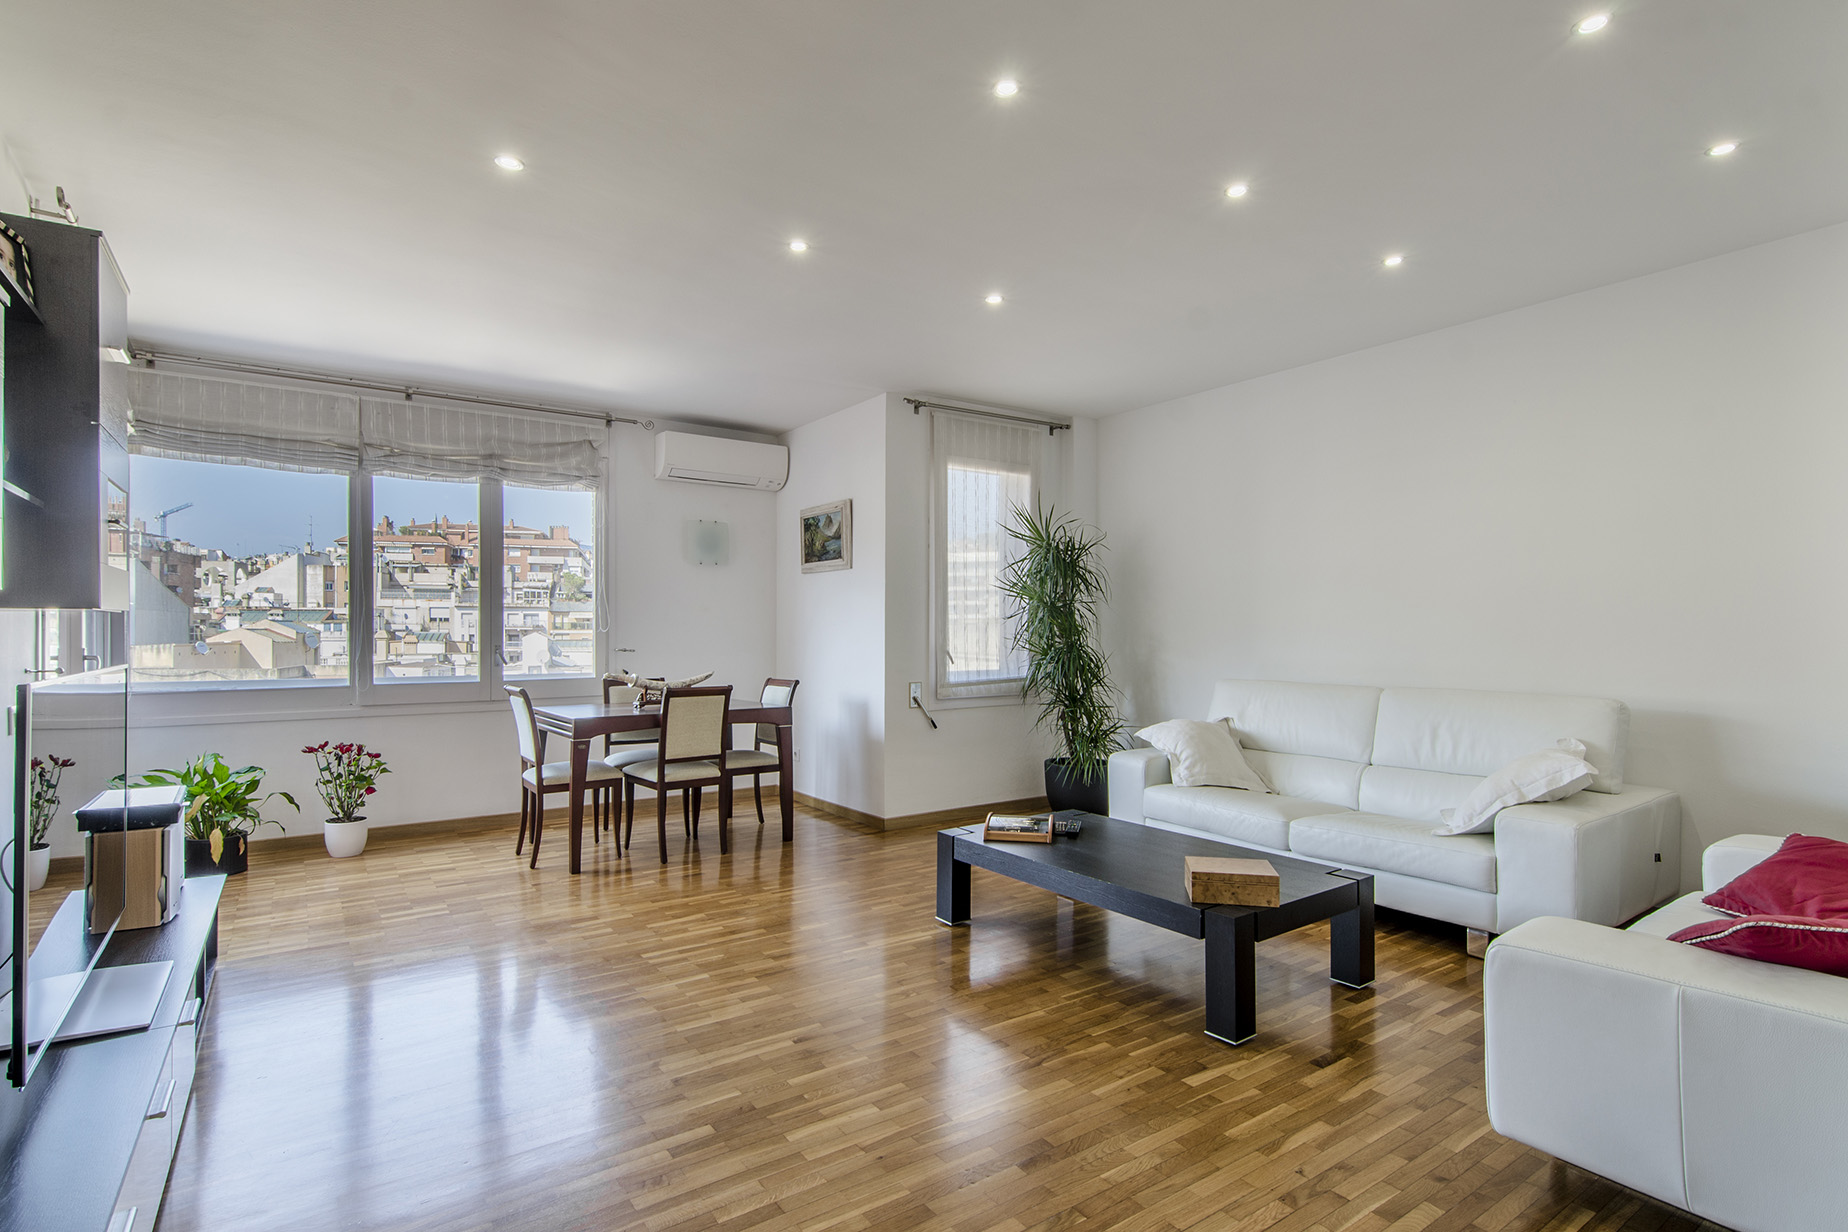 Apartment for Sale at Renovated Apartment in Plaza Bonanova Barcelona City, Barcelona, 08034 Spain